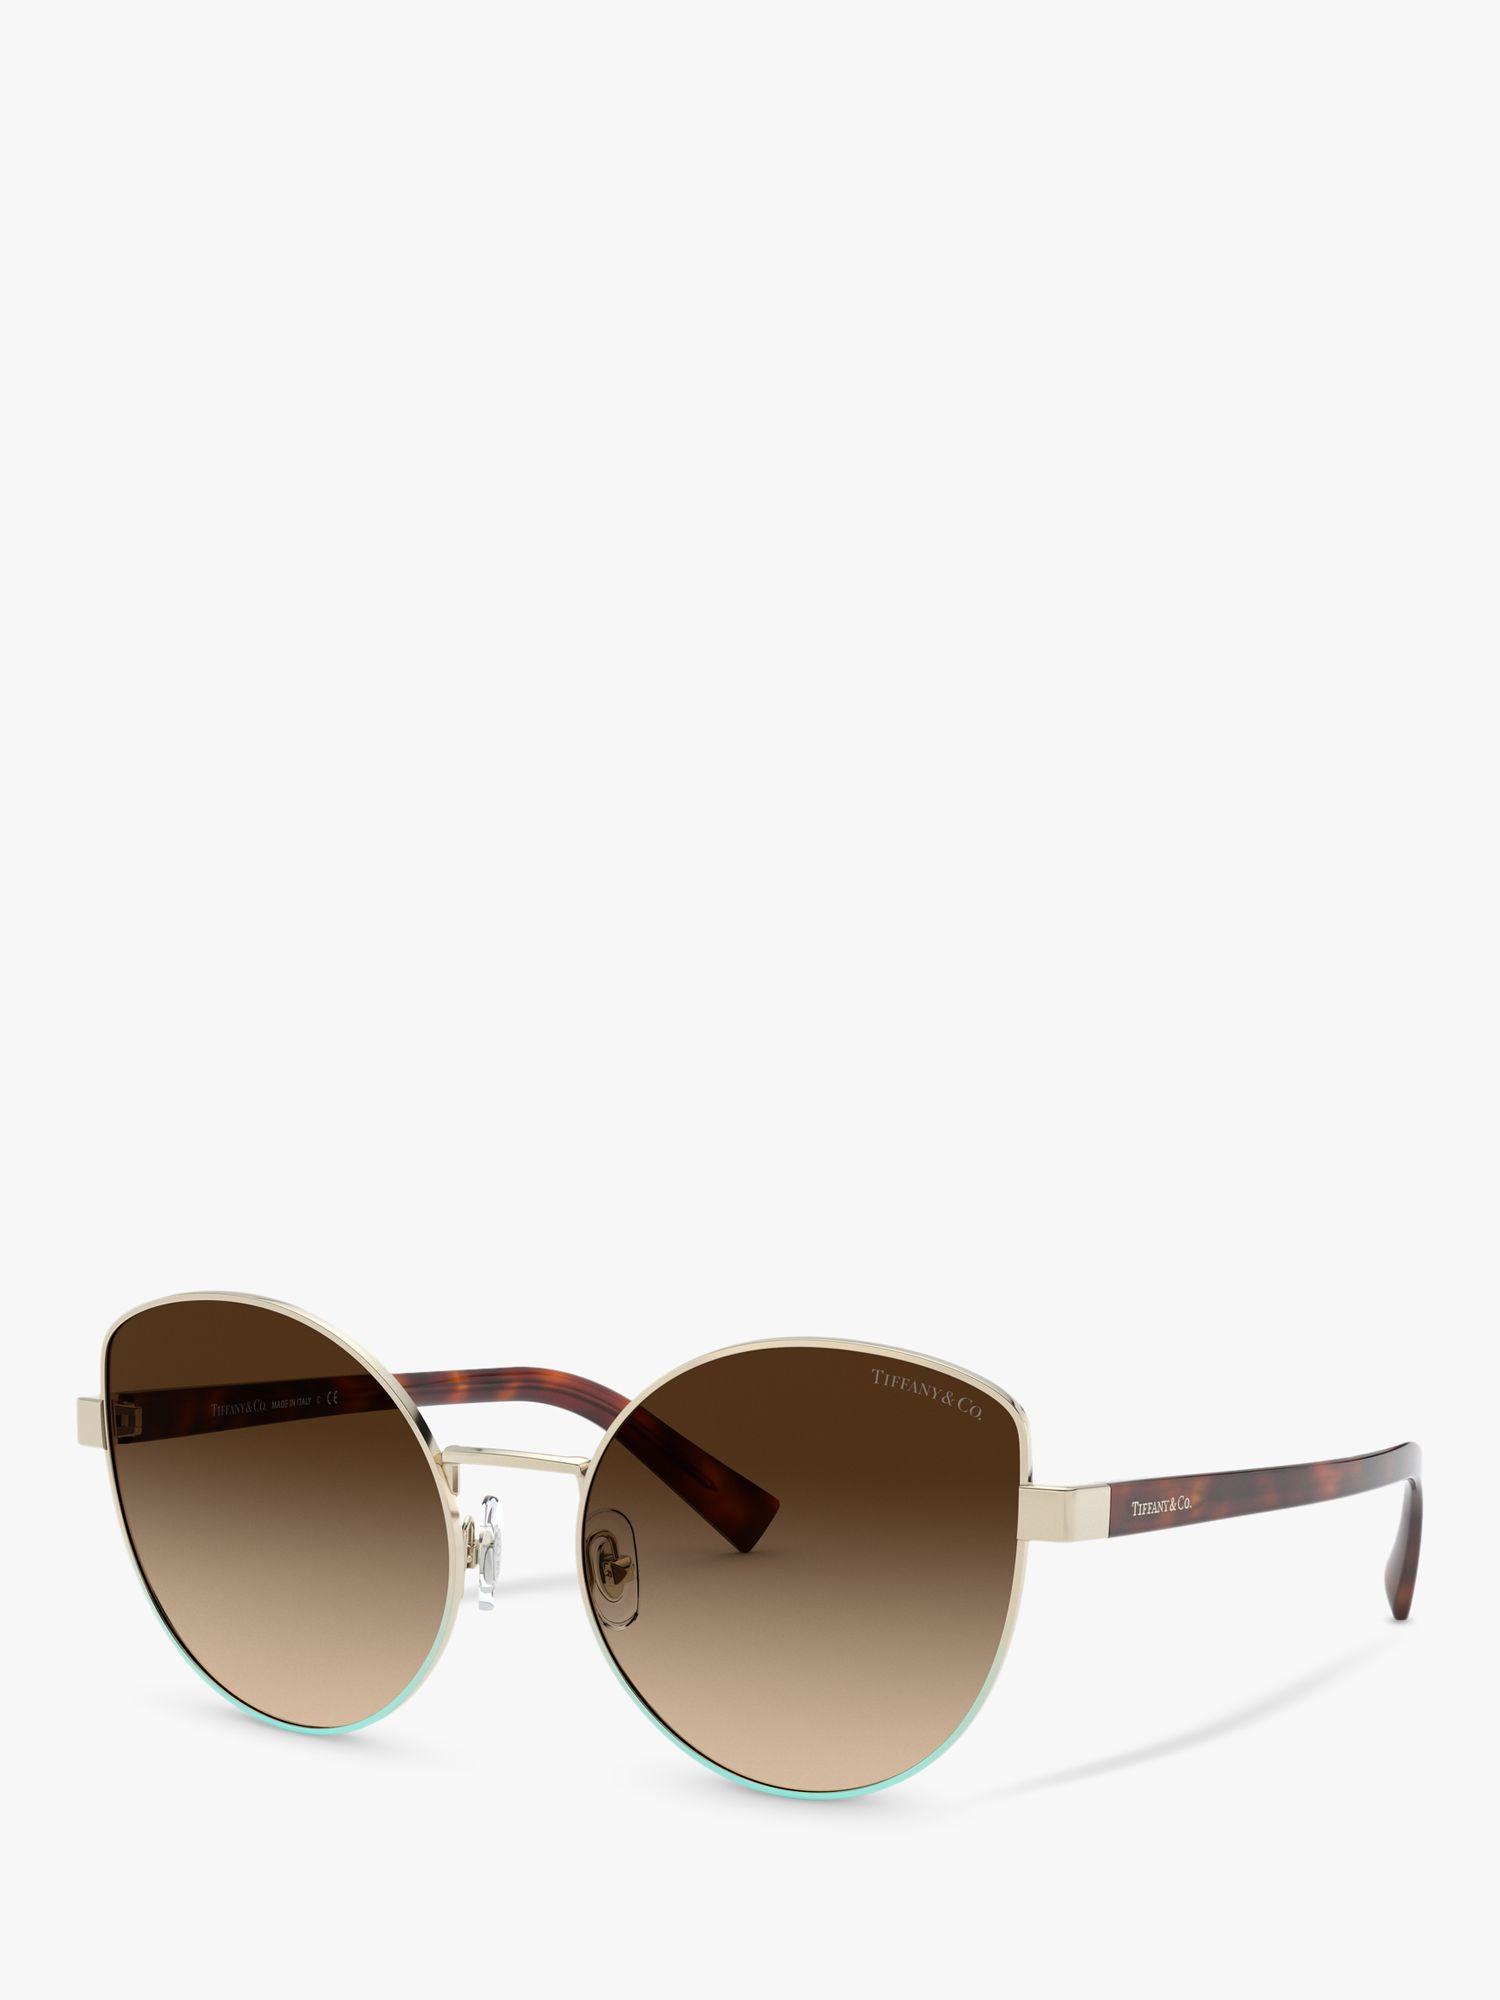 Tiffany & Co Tiffany & Co TF3068 Women's Irregular Sunglasses, Pale Gold/Brown Gradient